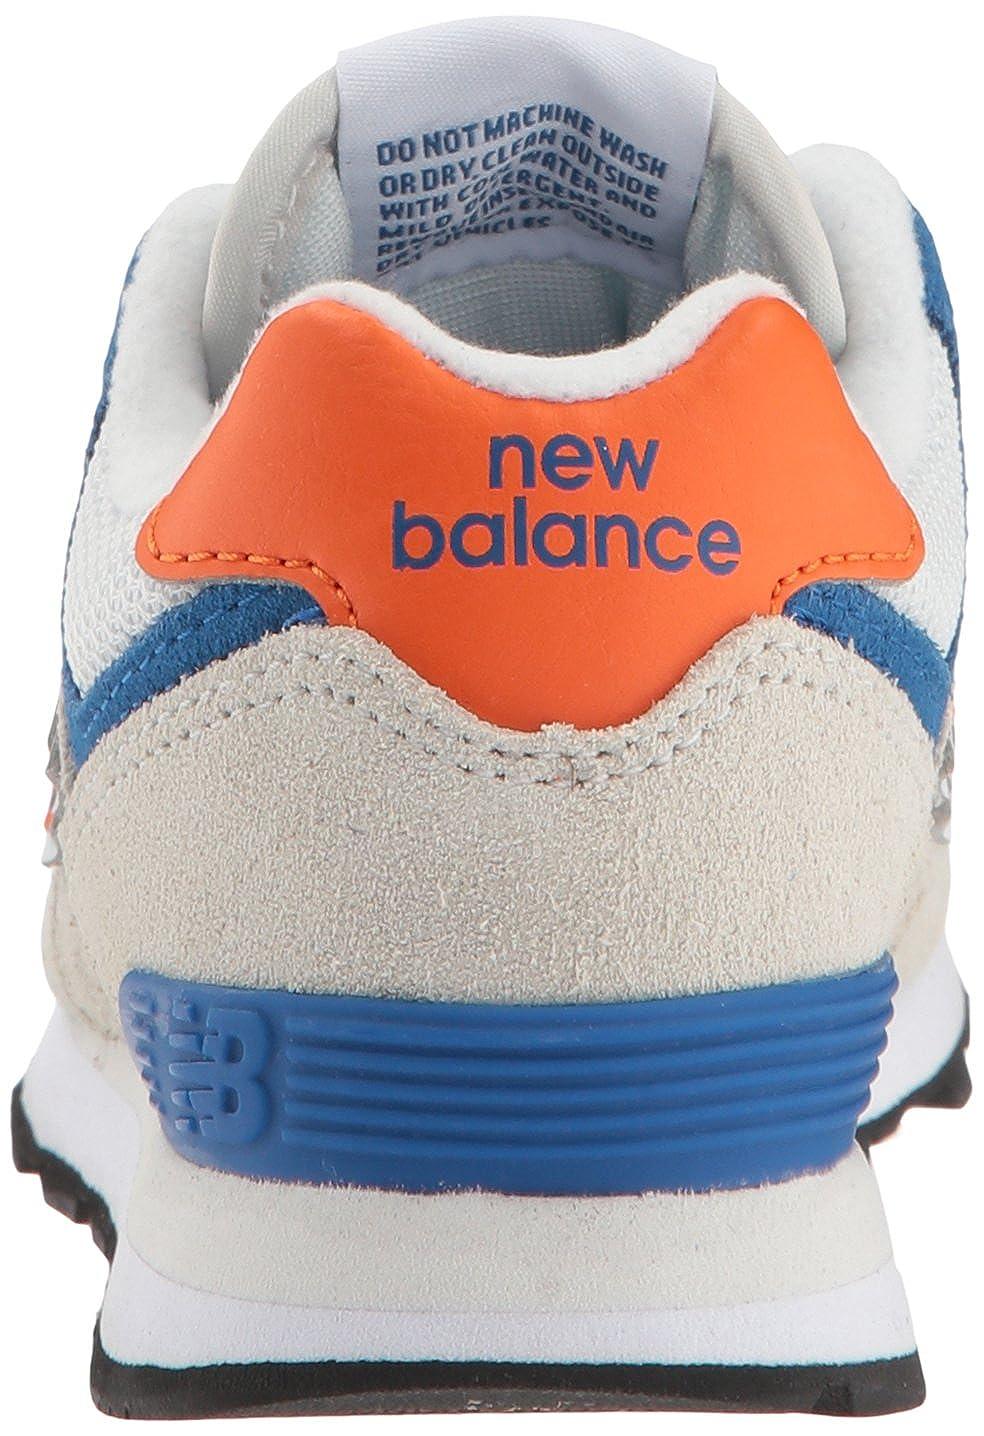 New Balance Unisex-Kinder 574v2 Turnschuhe Turnschuhe Turnschuhe  faf88d